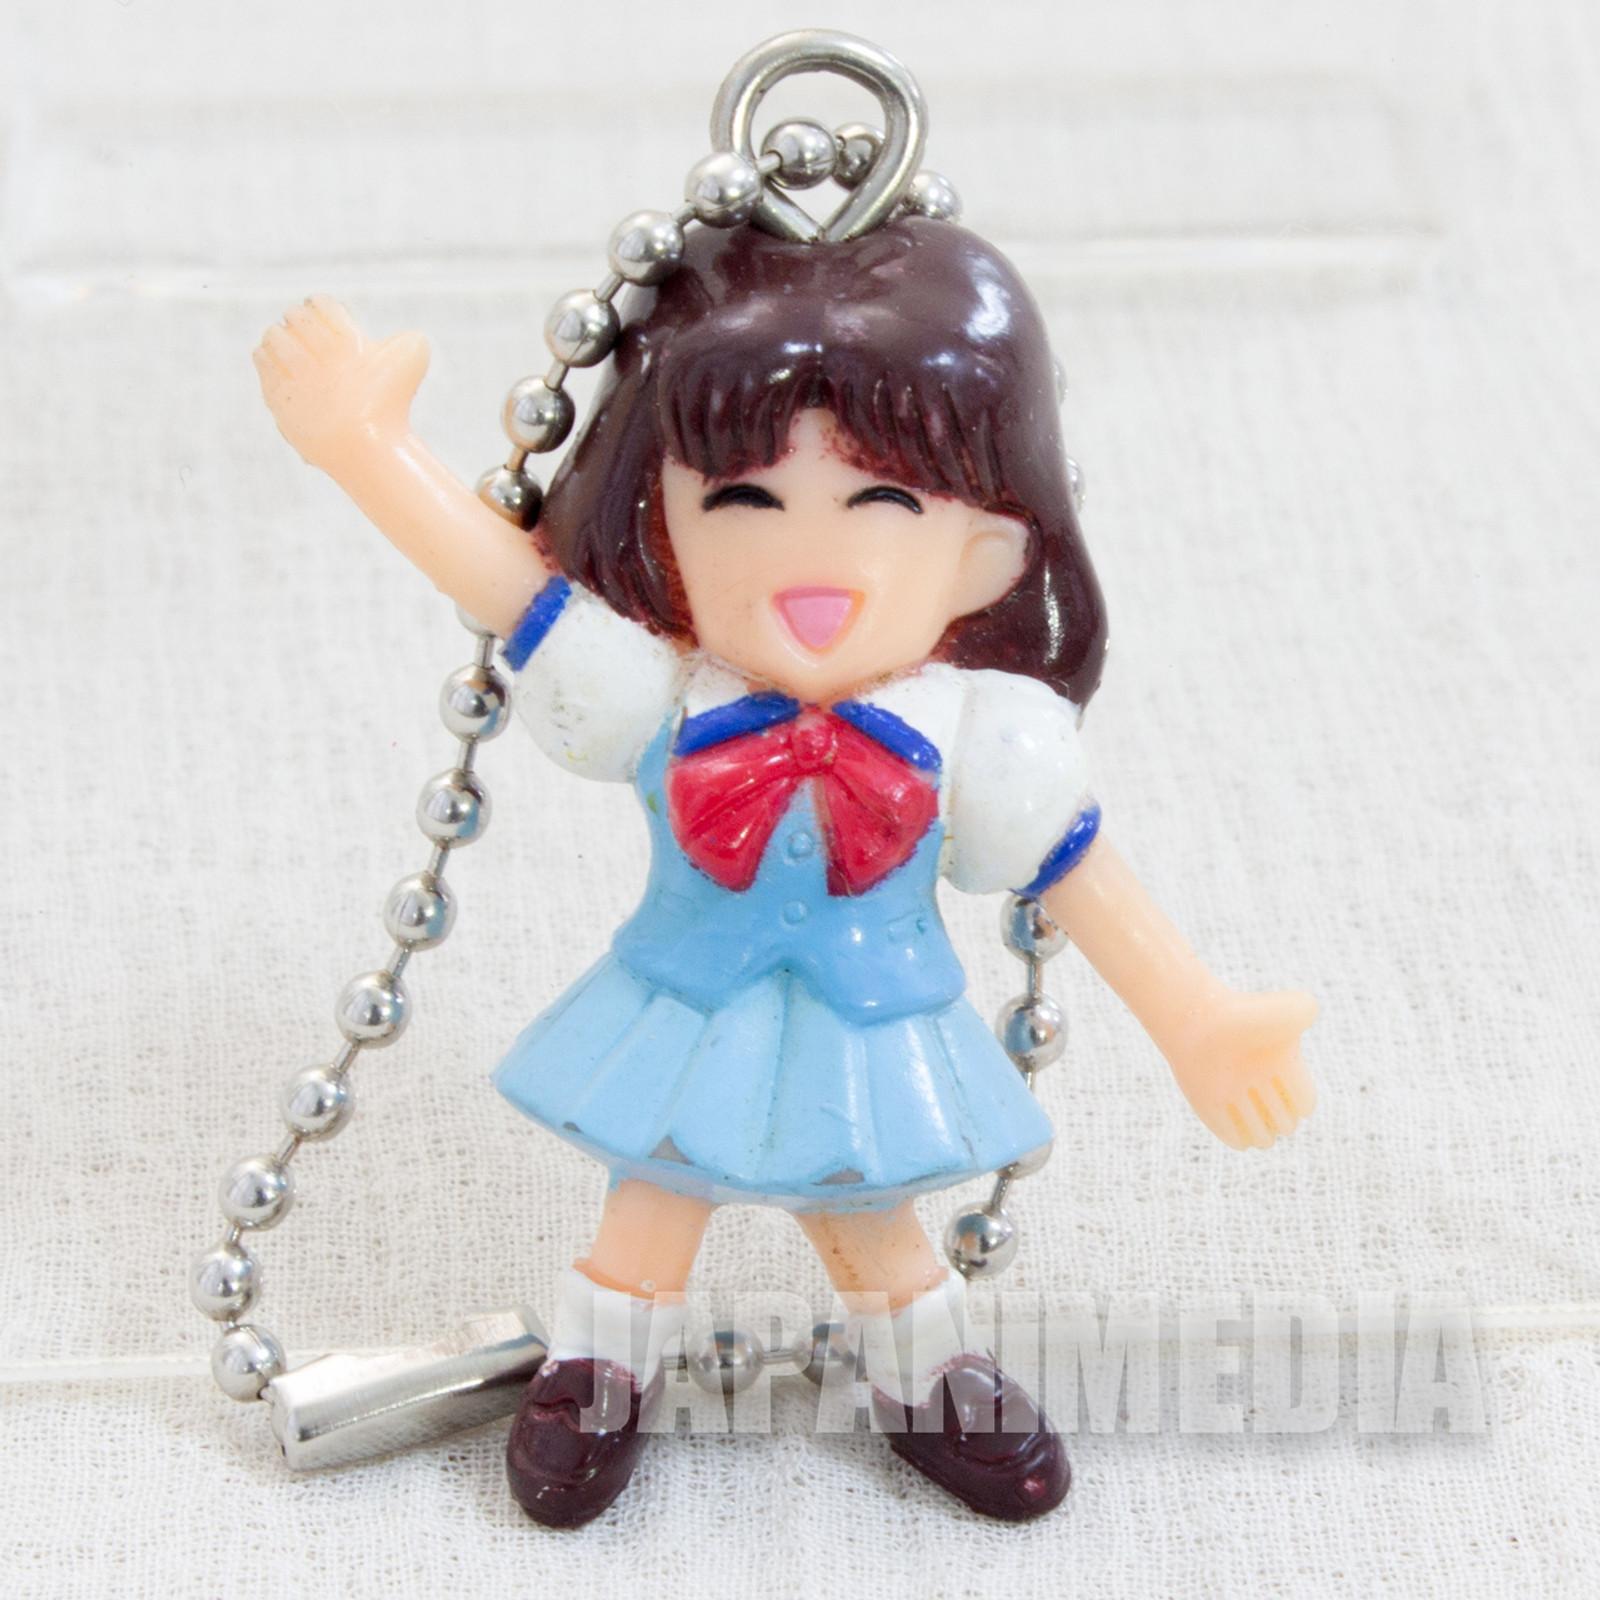 SLAM DUNK Haruko Akagi Mini Figure Ball Key Chain JAPAN ANIME MANGA